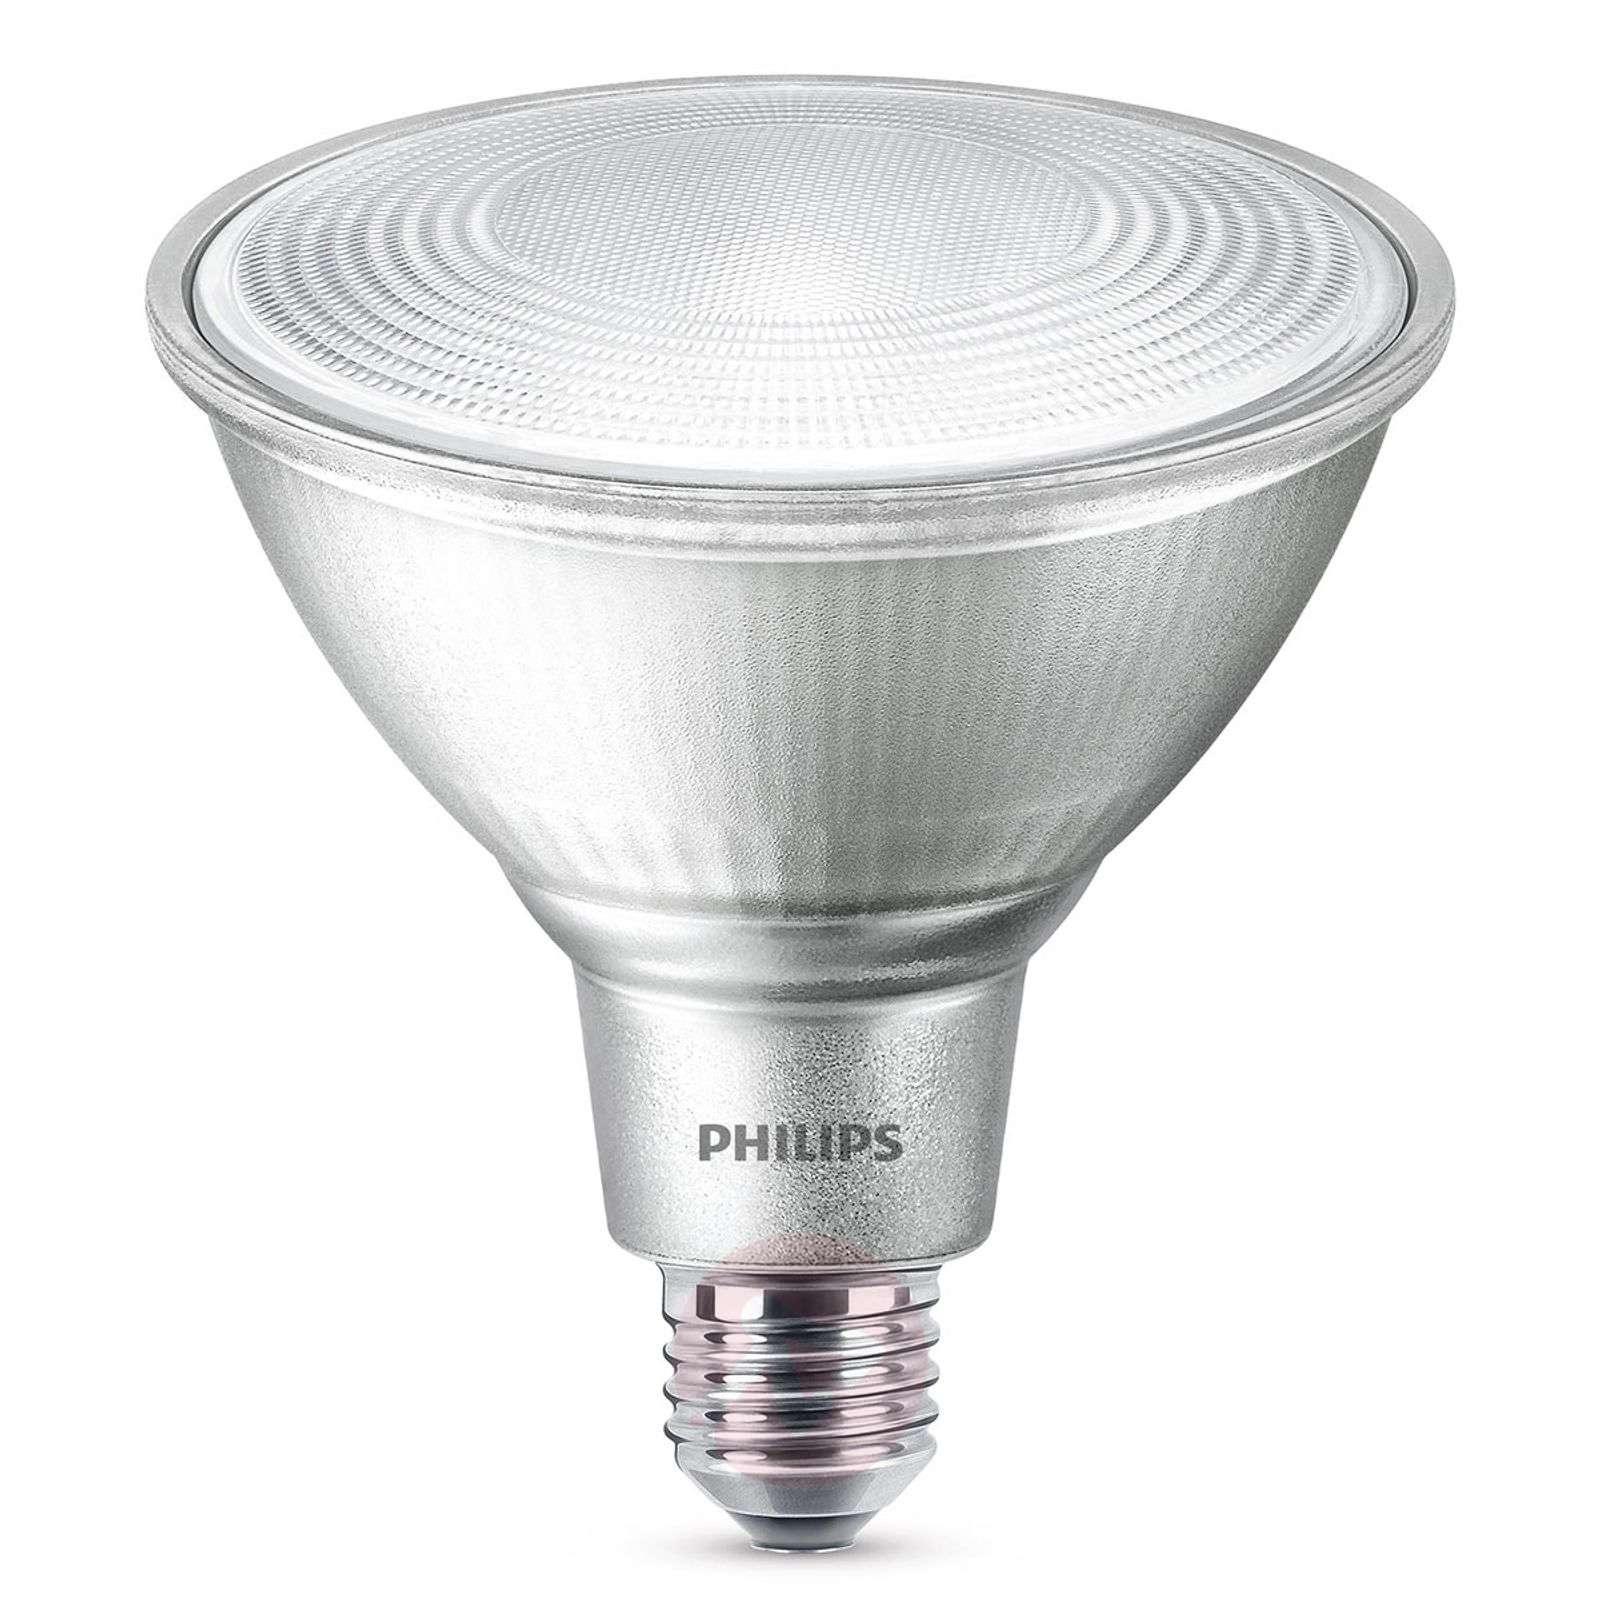 Tehokas LED-heijastinlamppu E27 PAR38 13W 2700 K-7530805-01